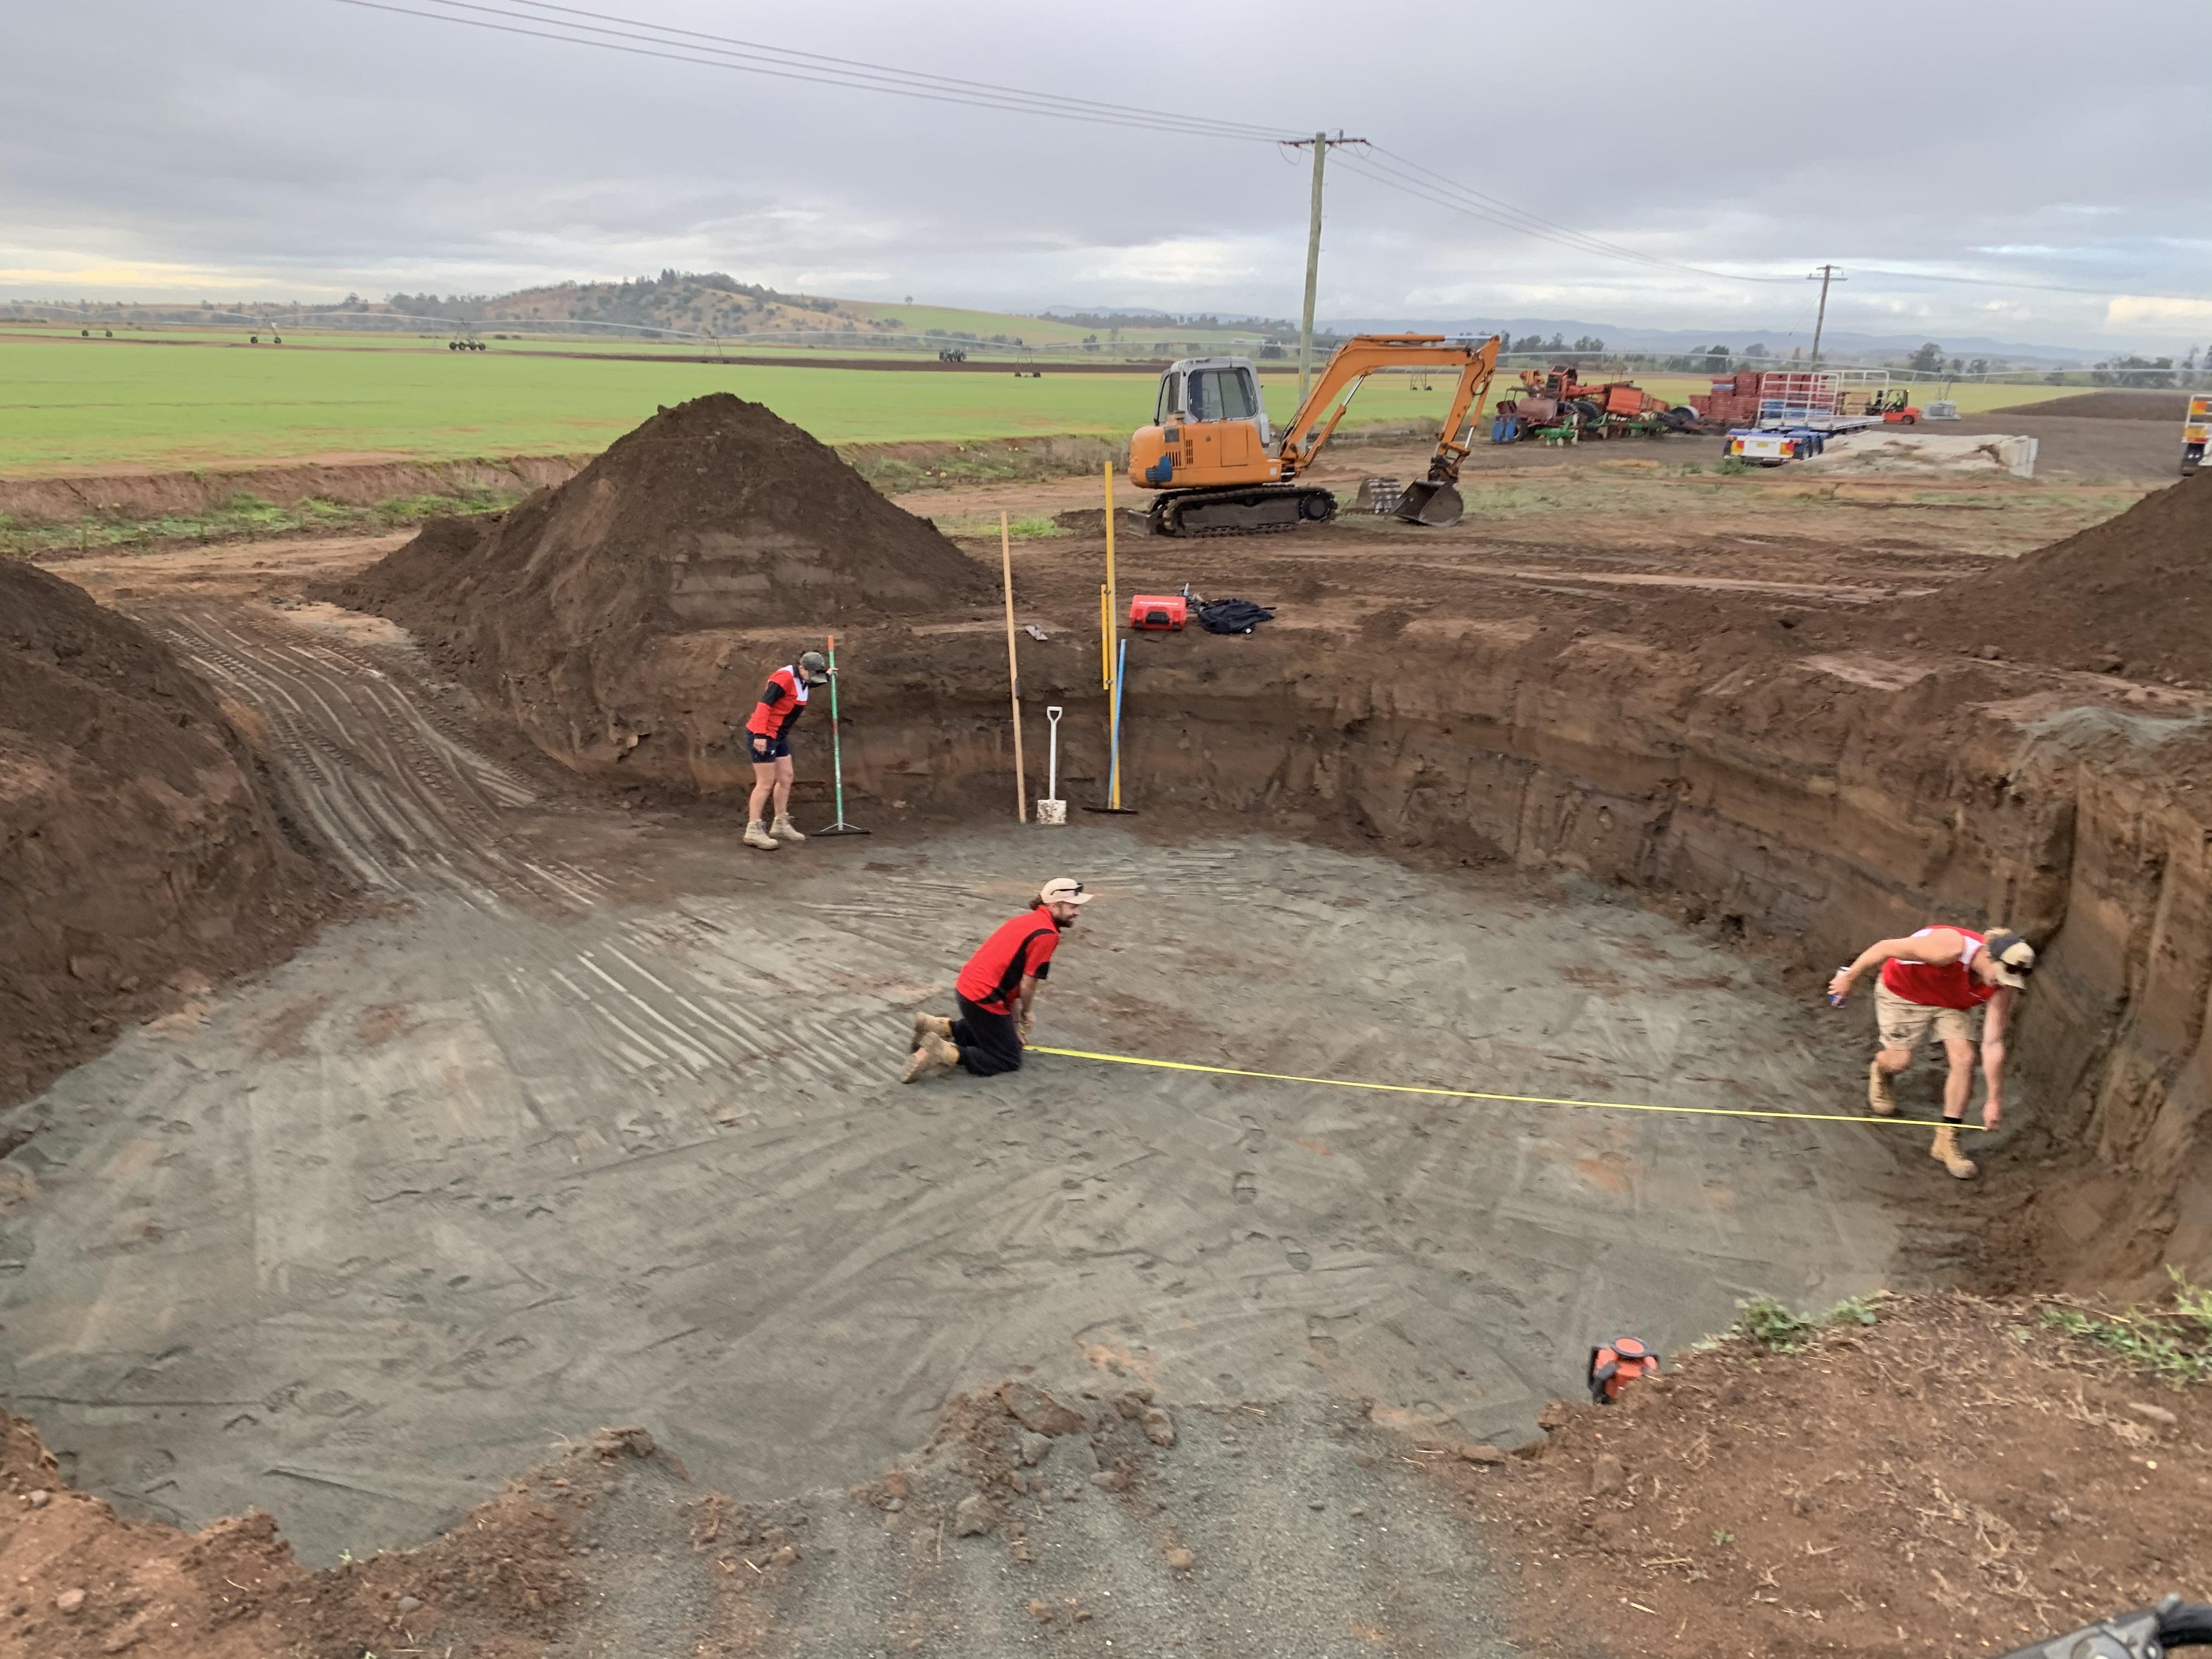 Preparing a pad for a built on-site 110,000 litre concrete rain water tank